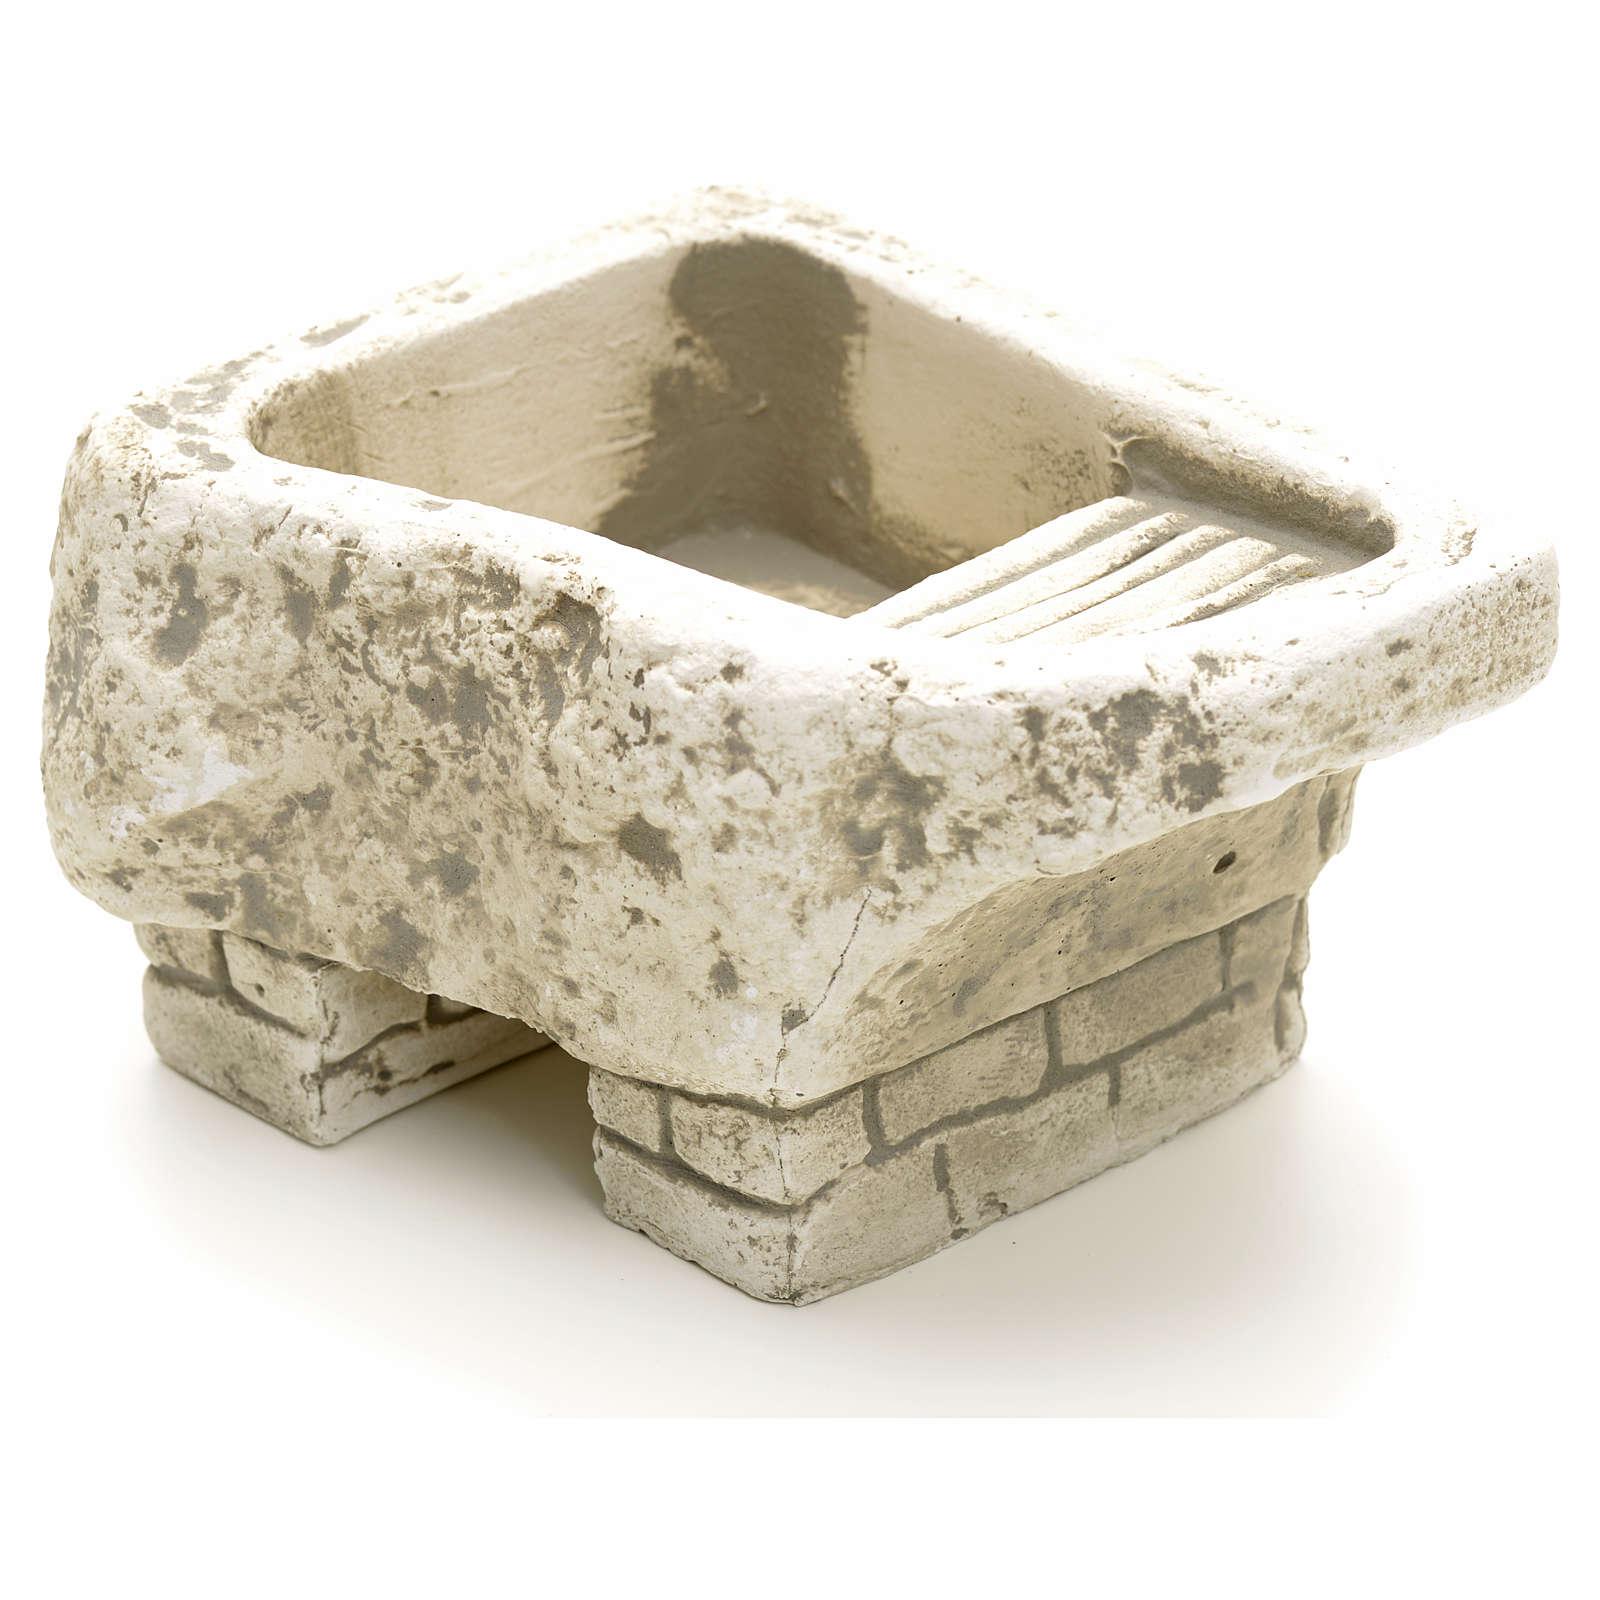 Washtub in plaster for nativities 4